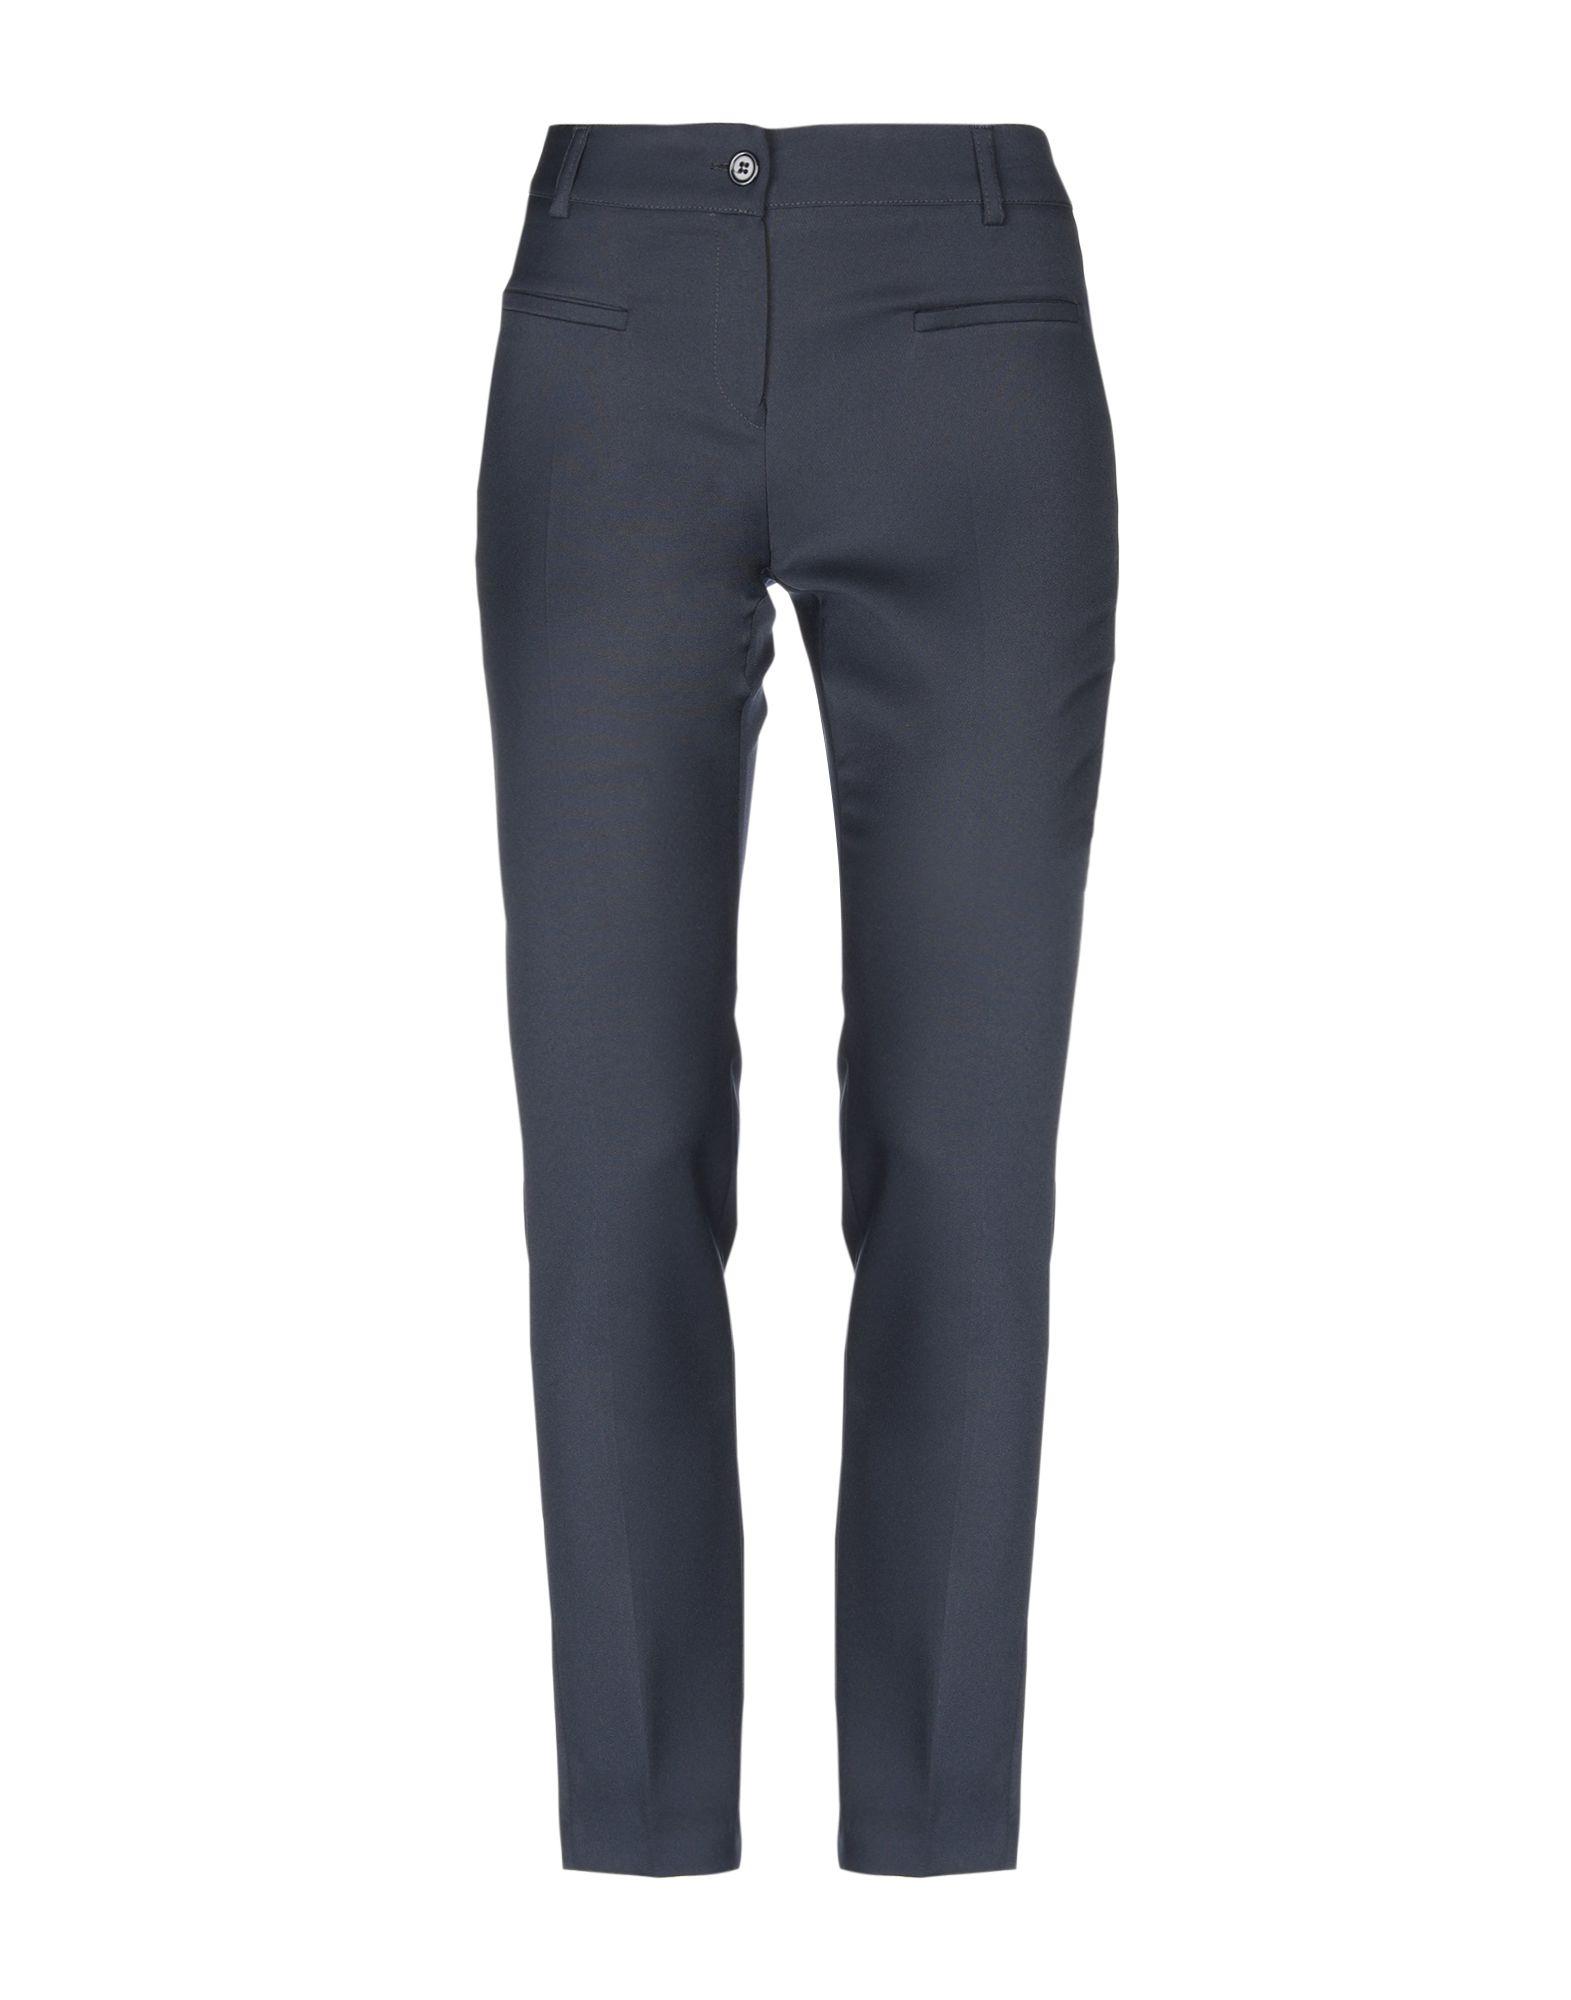 DIVA TREND® Повседневные брюки diva trend® куртка